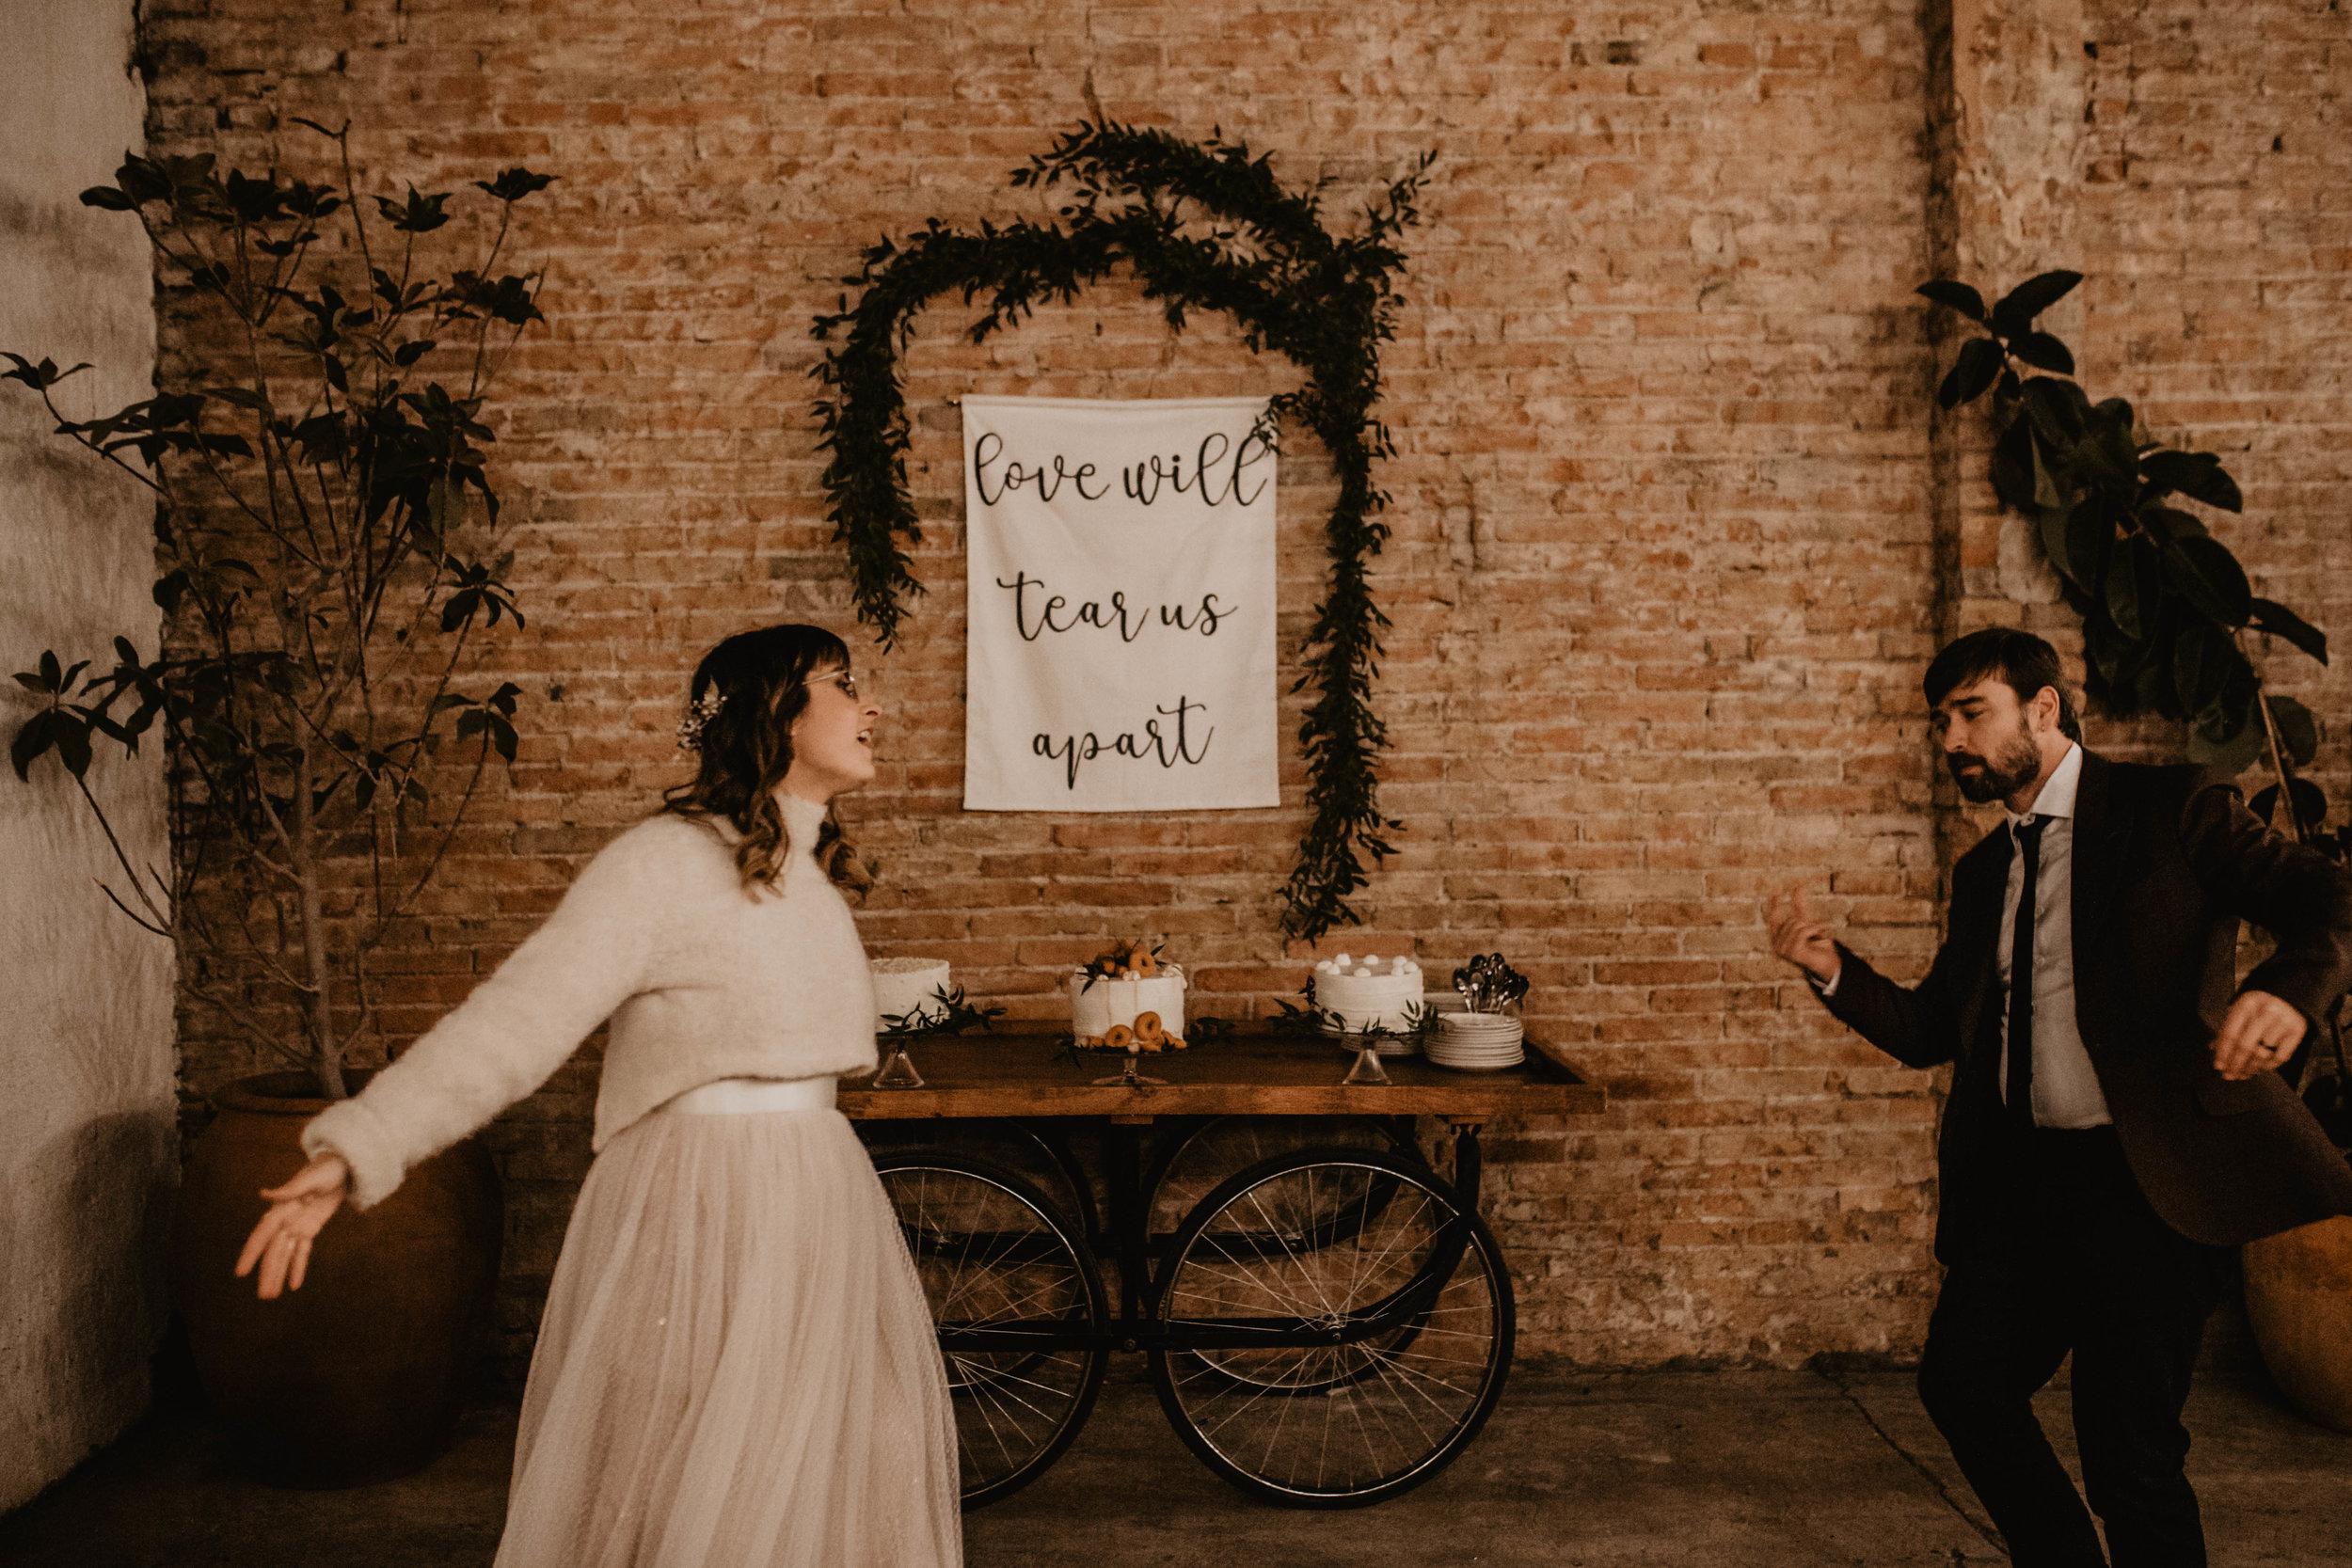 thenortherngirlphotography-photography-weddingphotography-couple-bodasconestilo-bodasenbarcelona-martadavid-1069.jpg